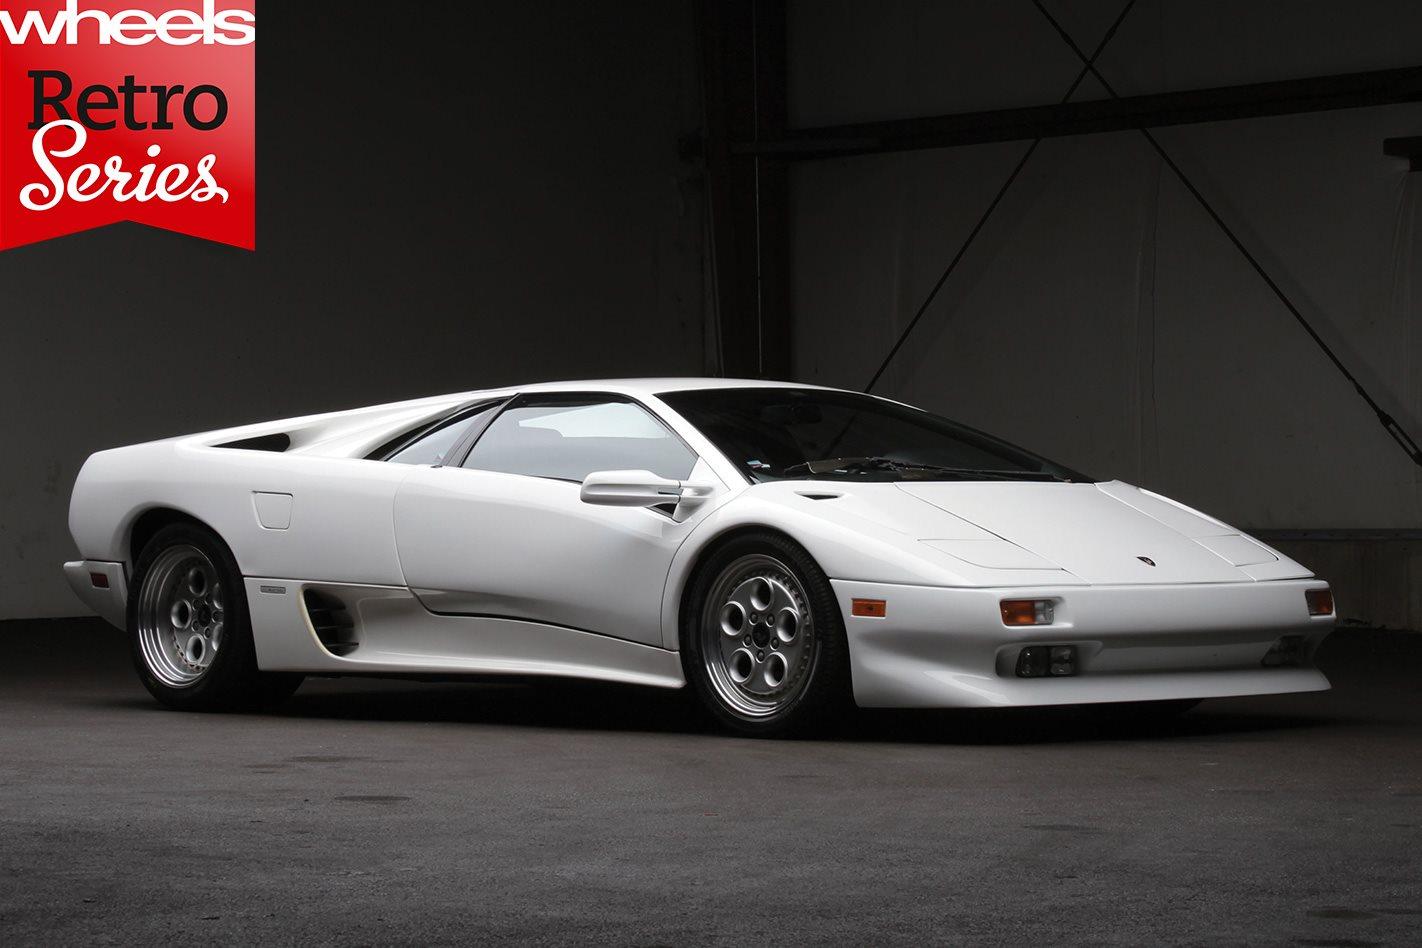 1990 Lamborghini Diablo Retro Series